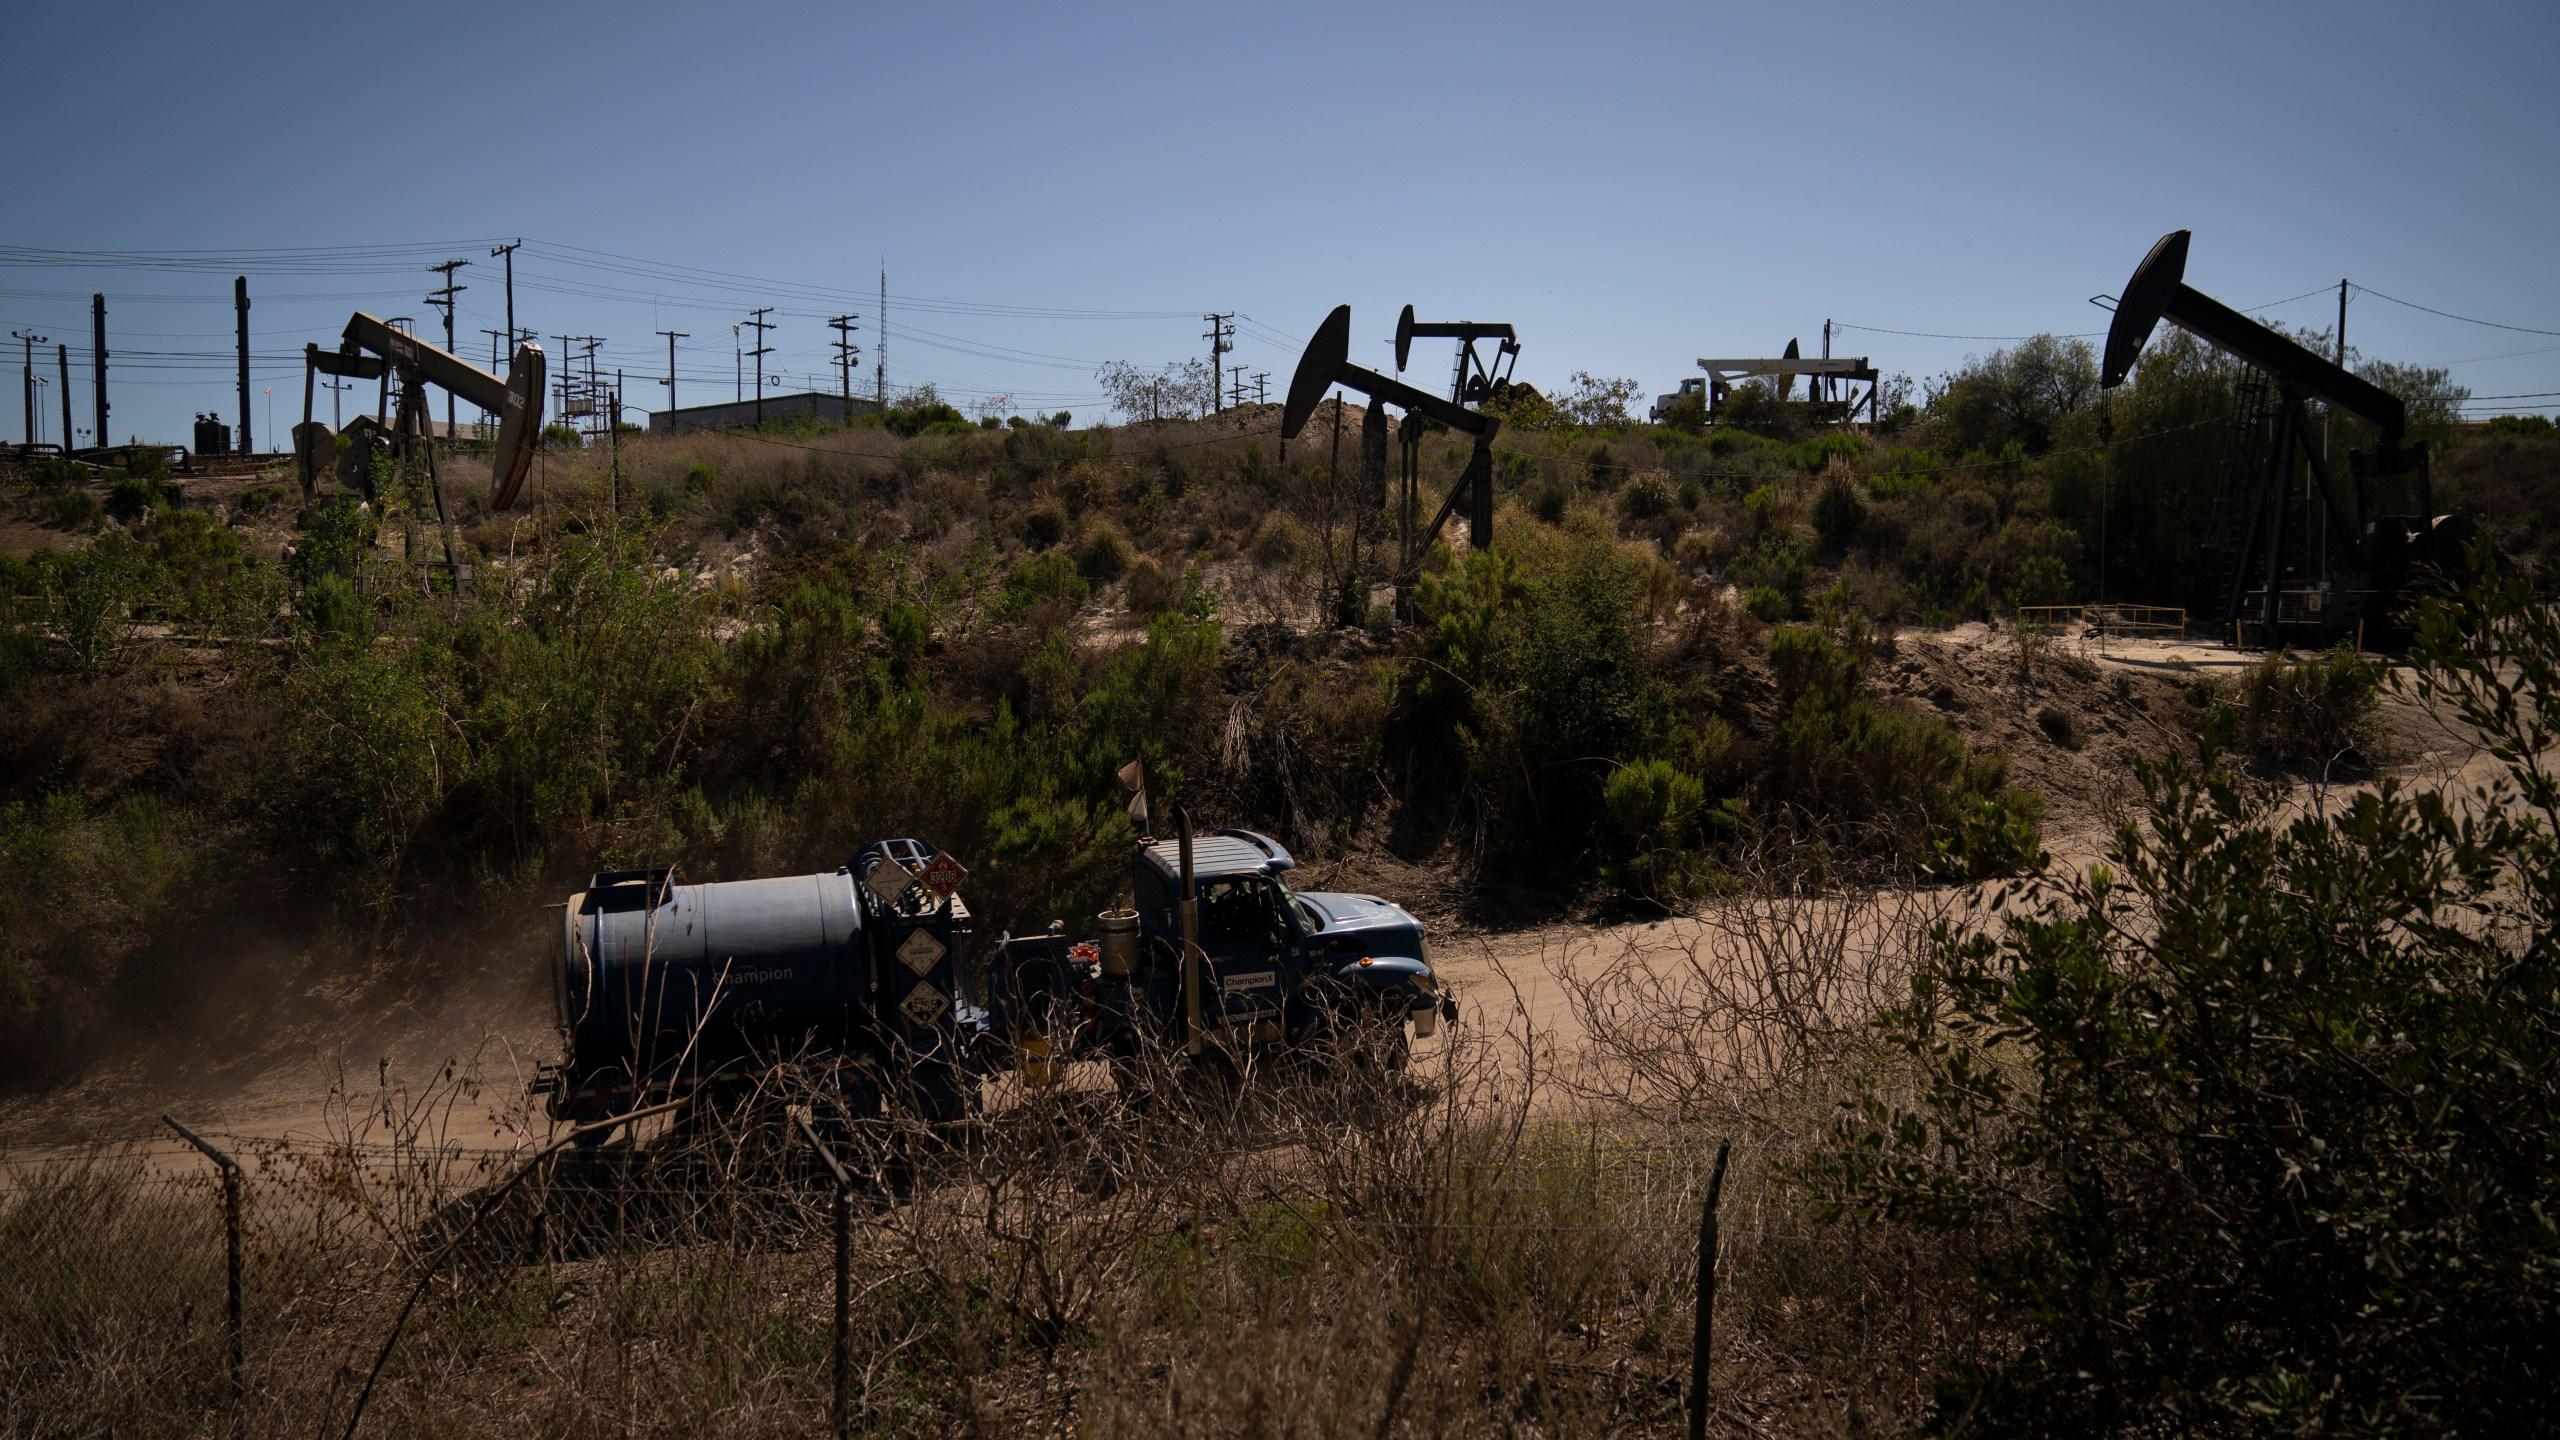 A truck drives past pump jacks operating at the Inglewood Oil Field on June 10, 2021, in Los Angeles. (AP Photo/Jae C. Hong)